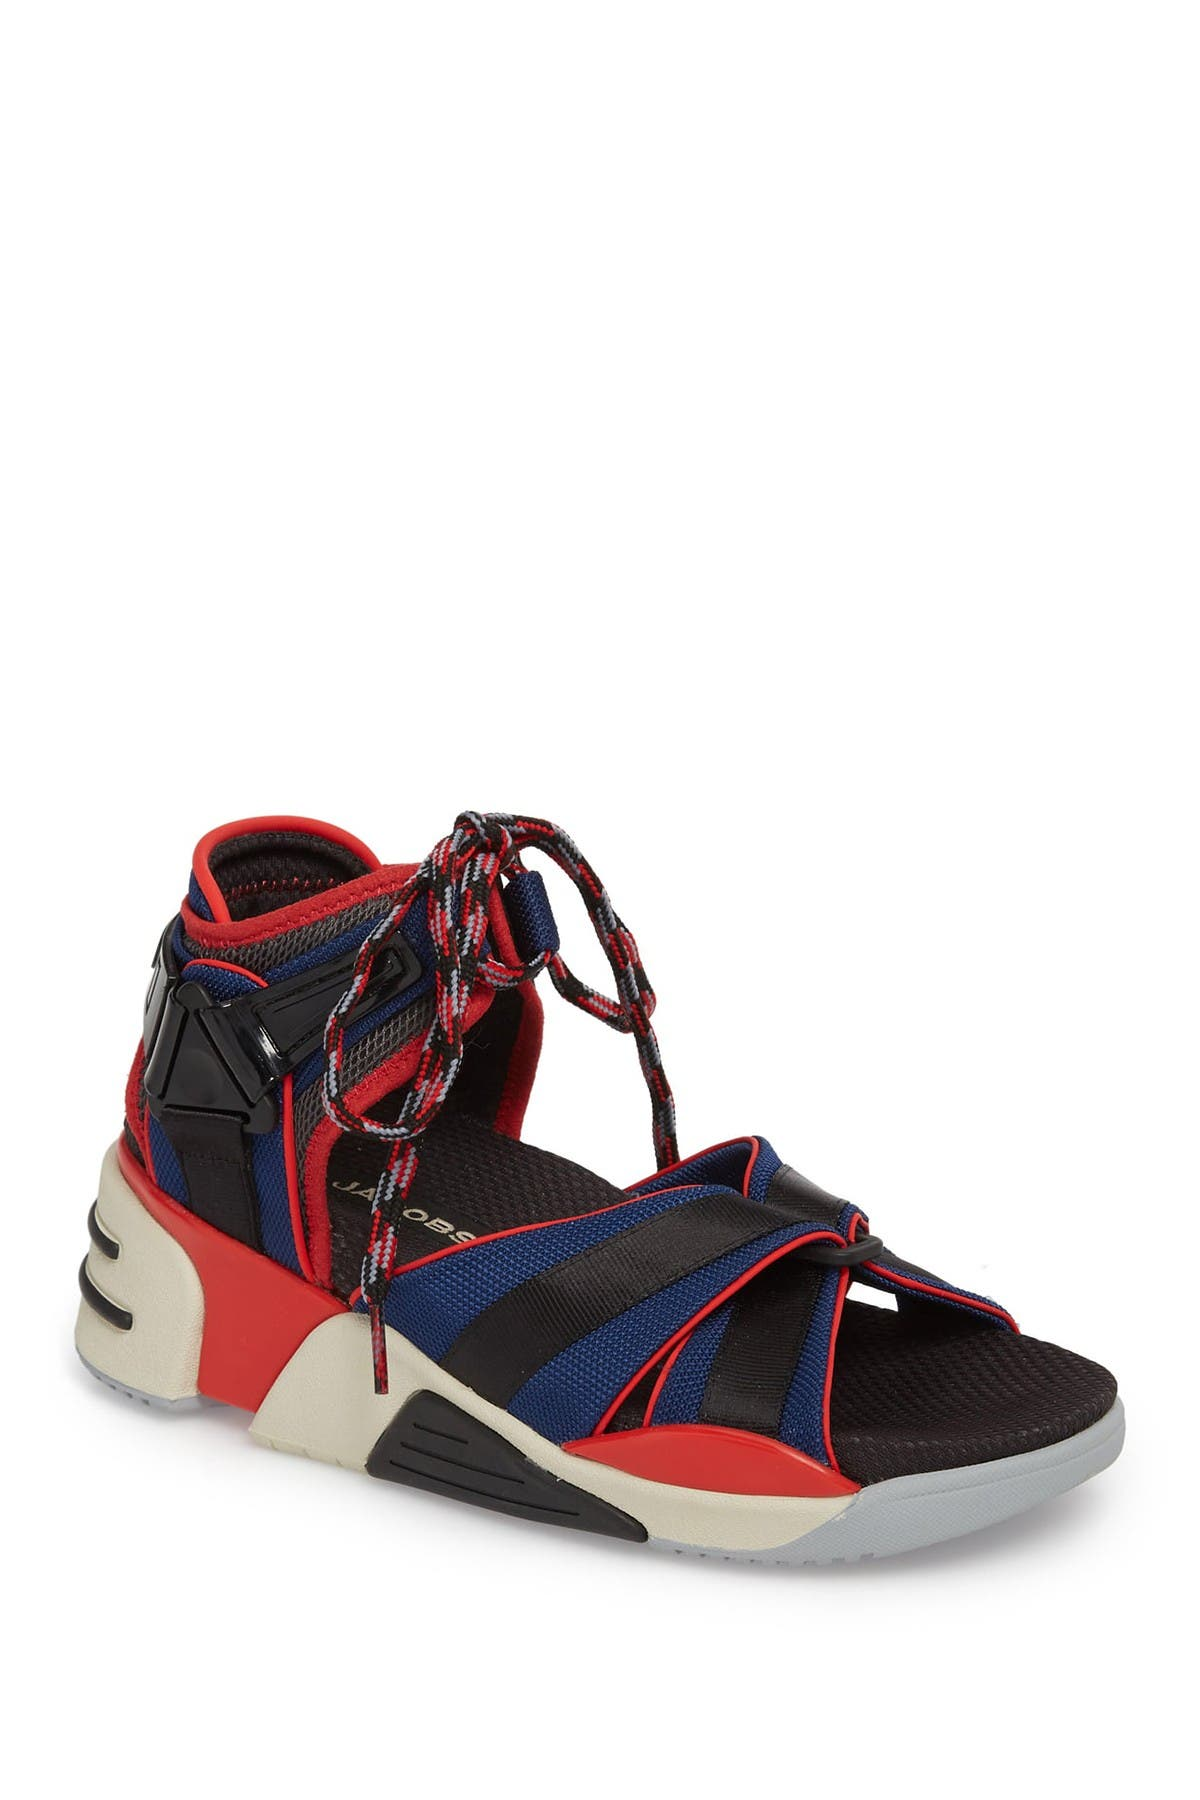 Marc Jacobs   Somewhere Sport Sandal